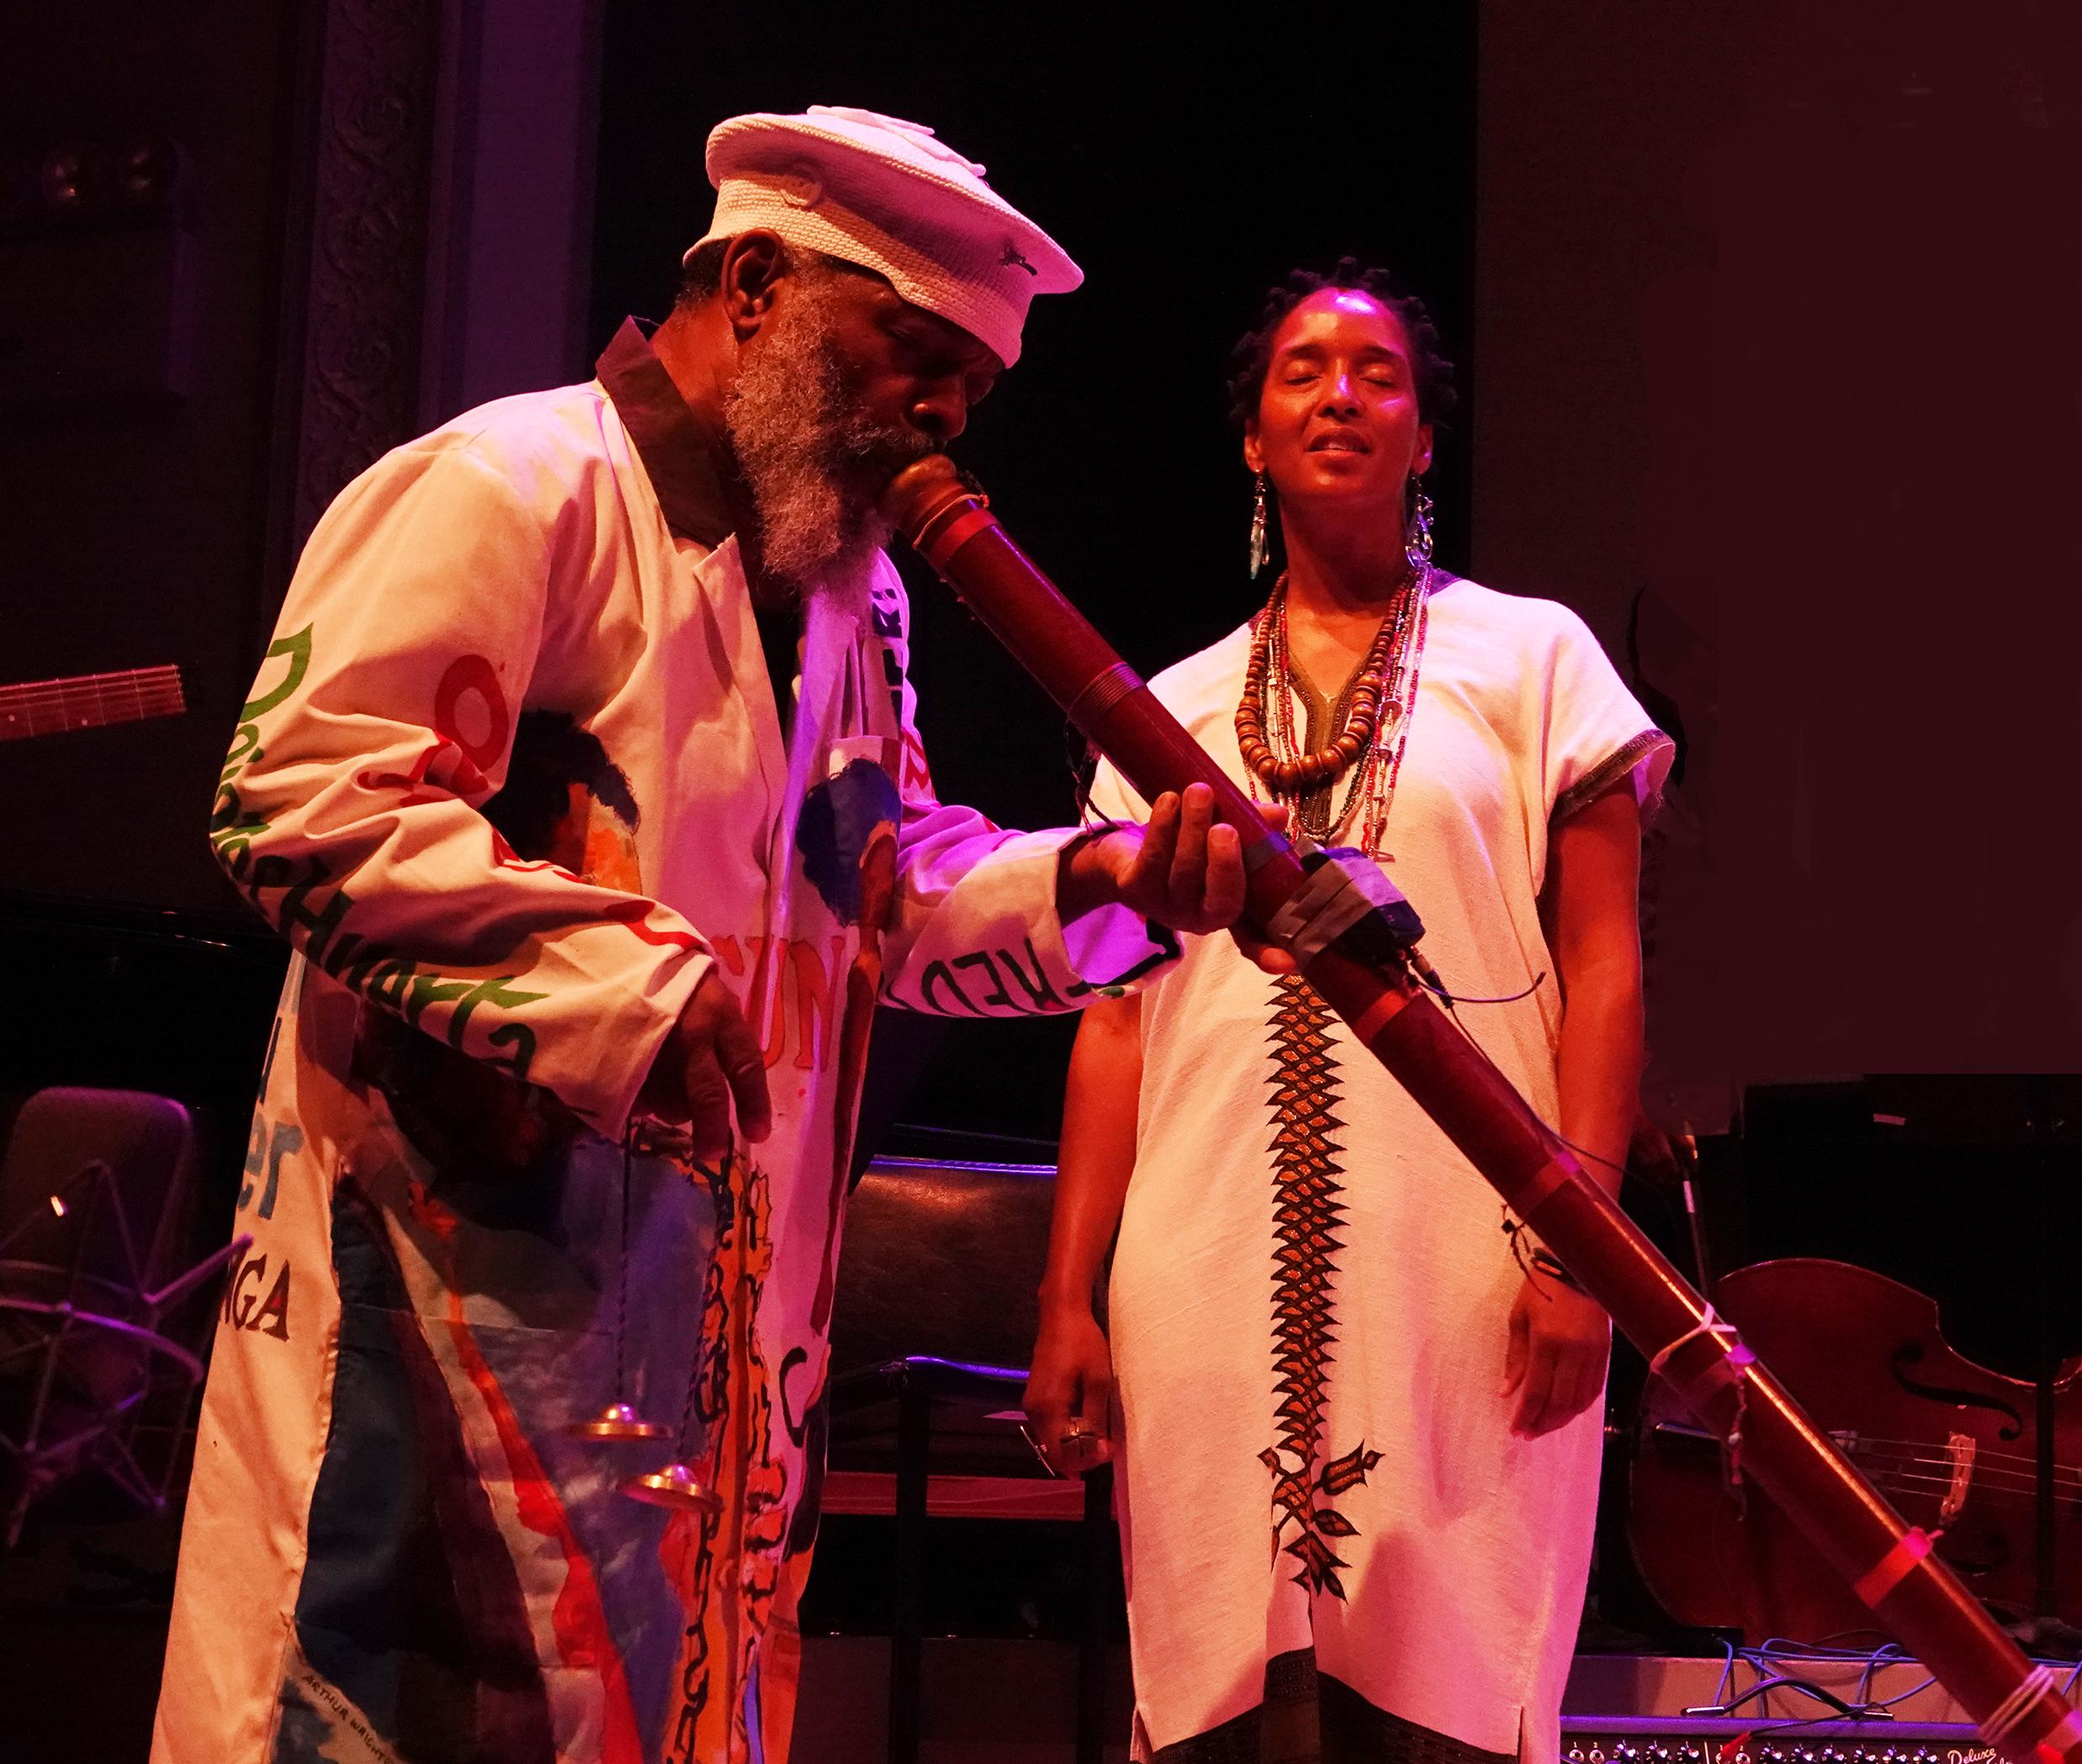 Douglas Ewart & Mankwe Ndosi at 24th Annual Vision Festival